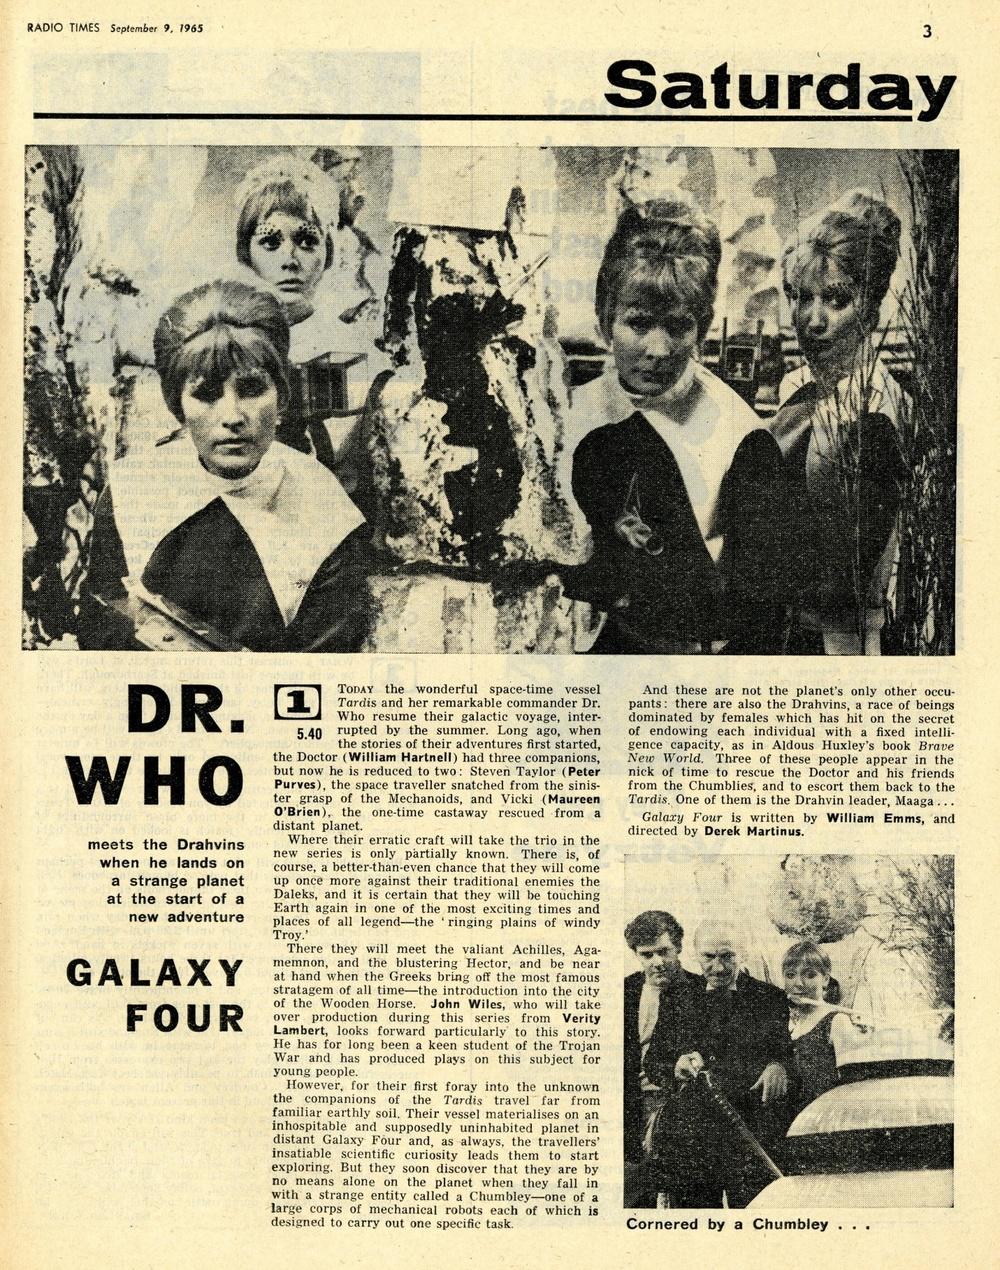 Radio Times, September 11-17, 1965